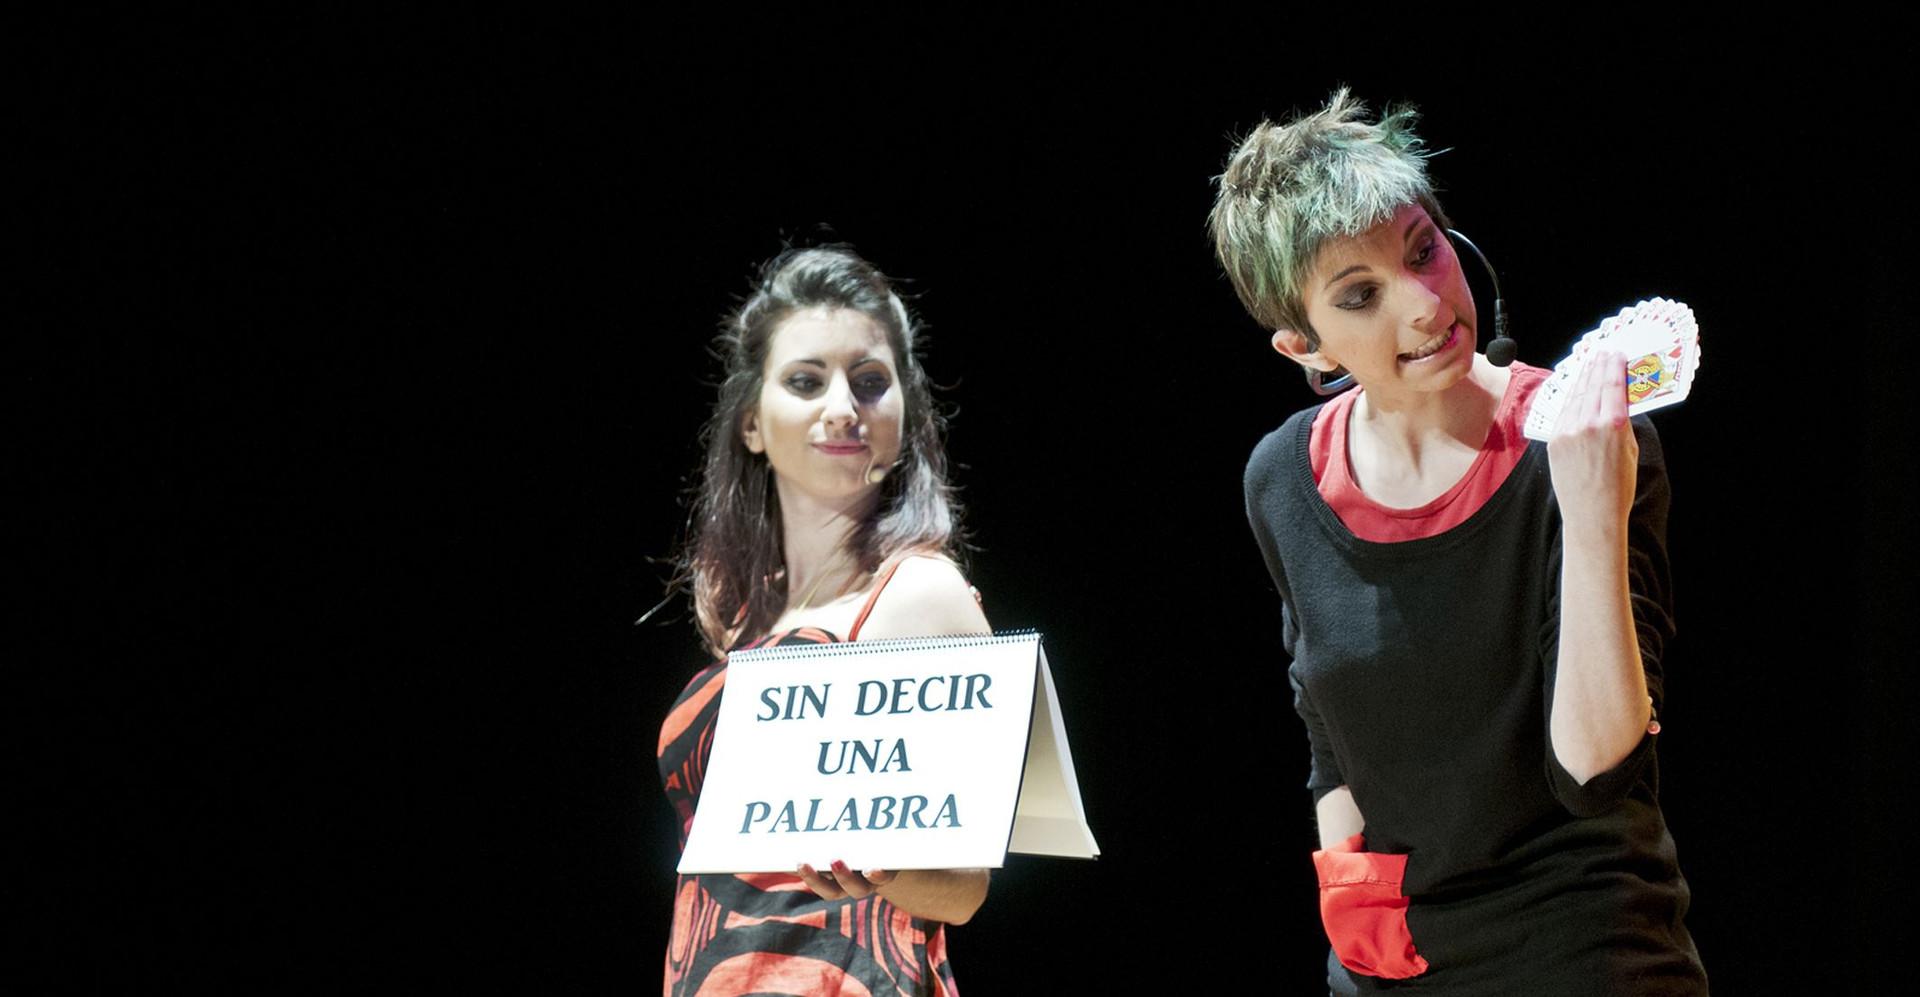 Imagina2 Niñas del Mago. Show de magia en teatro Barcelona, Zaragoza... Mujeres magas en españa